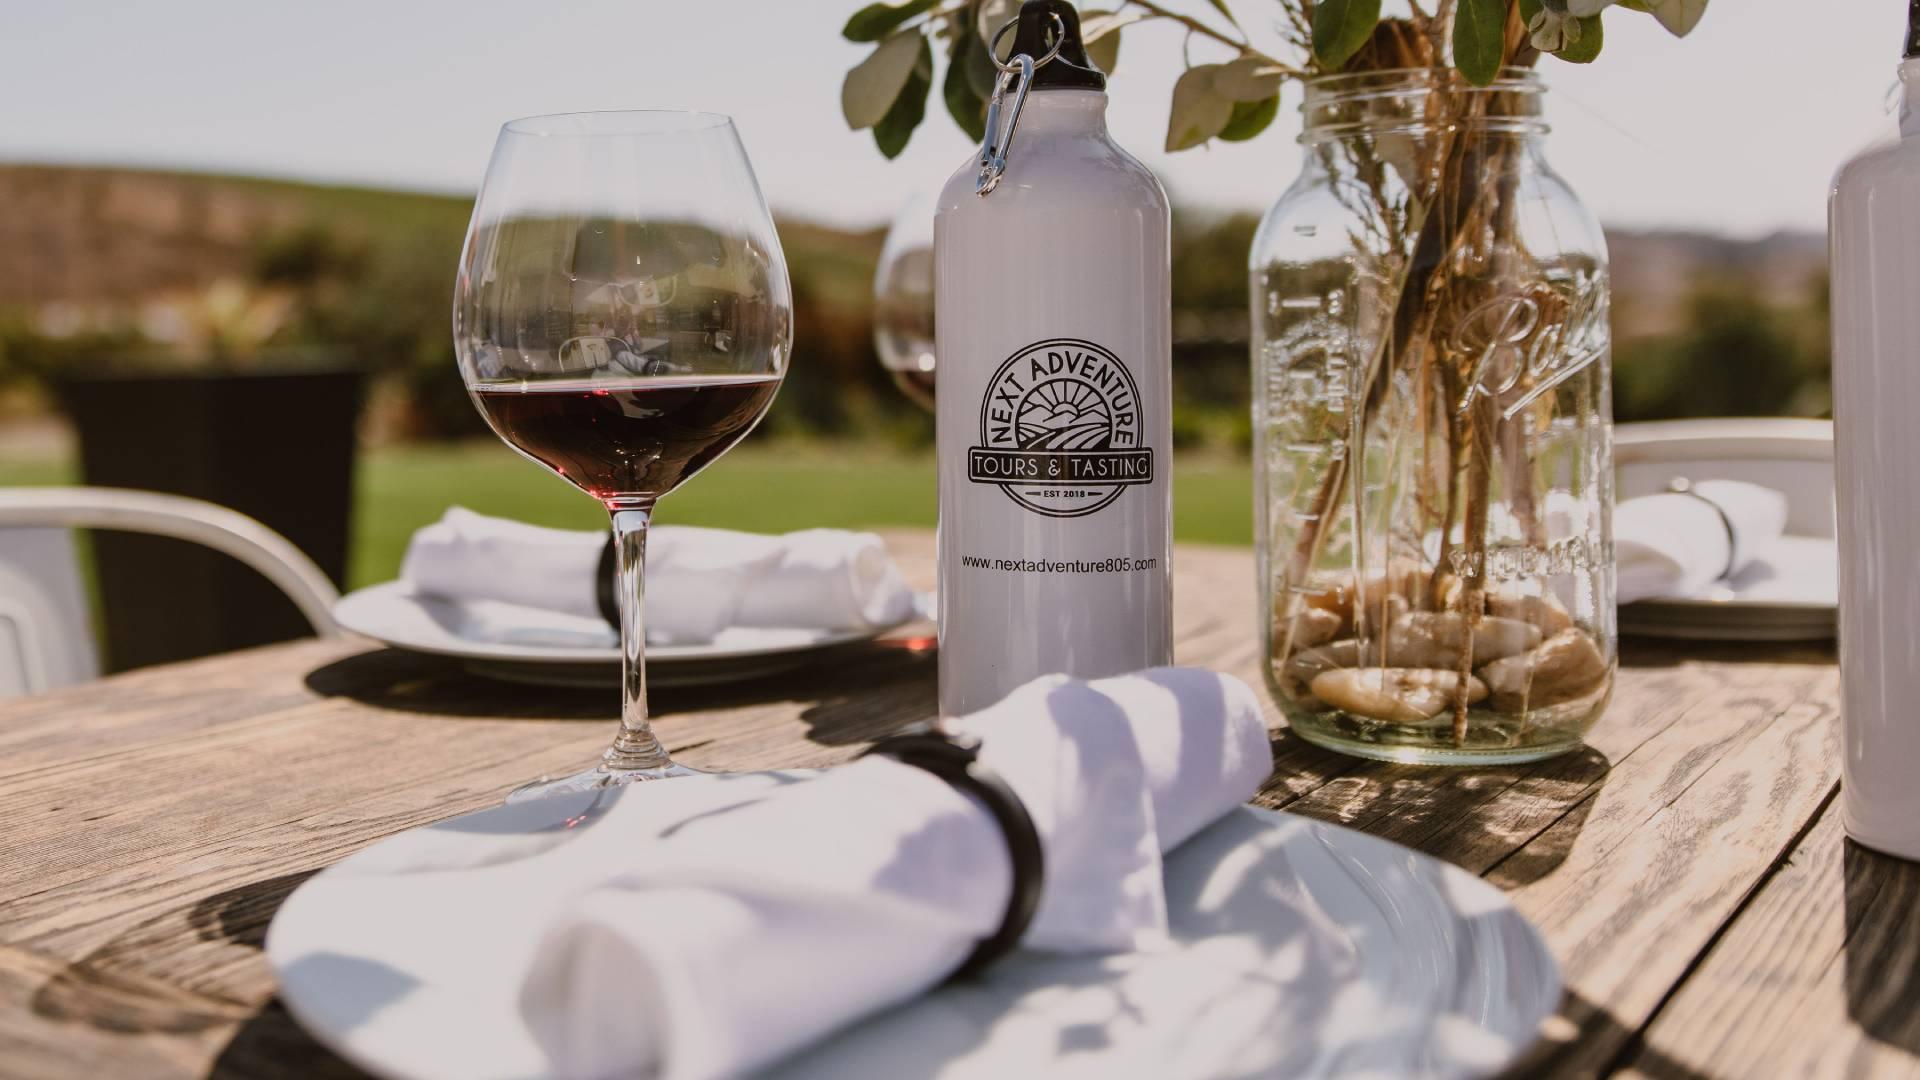 Estate Wine Tours Next Adventure 805 Santa Barbara-22